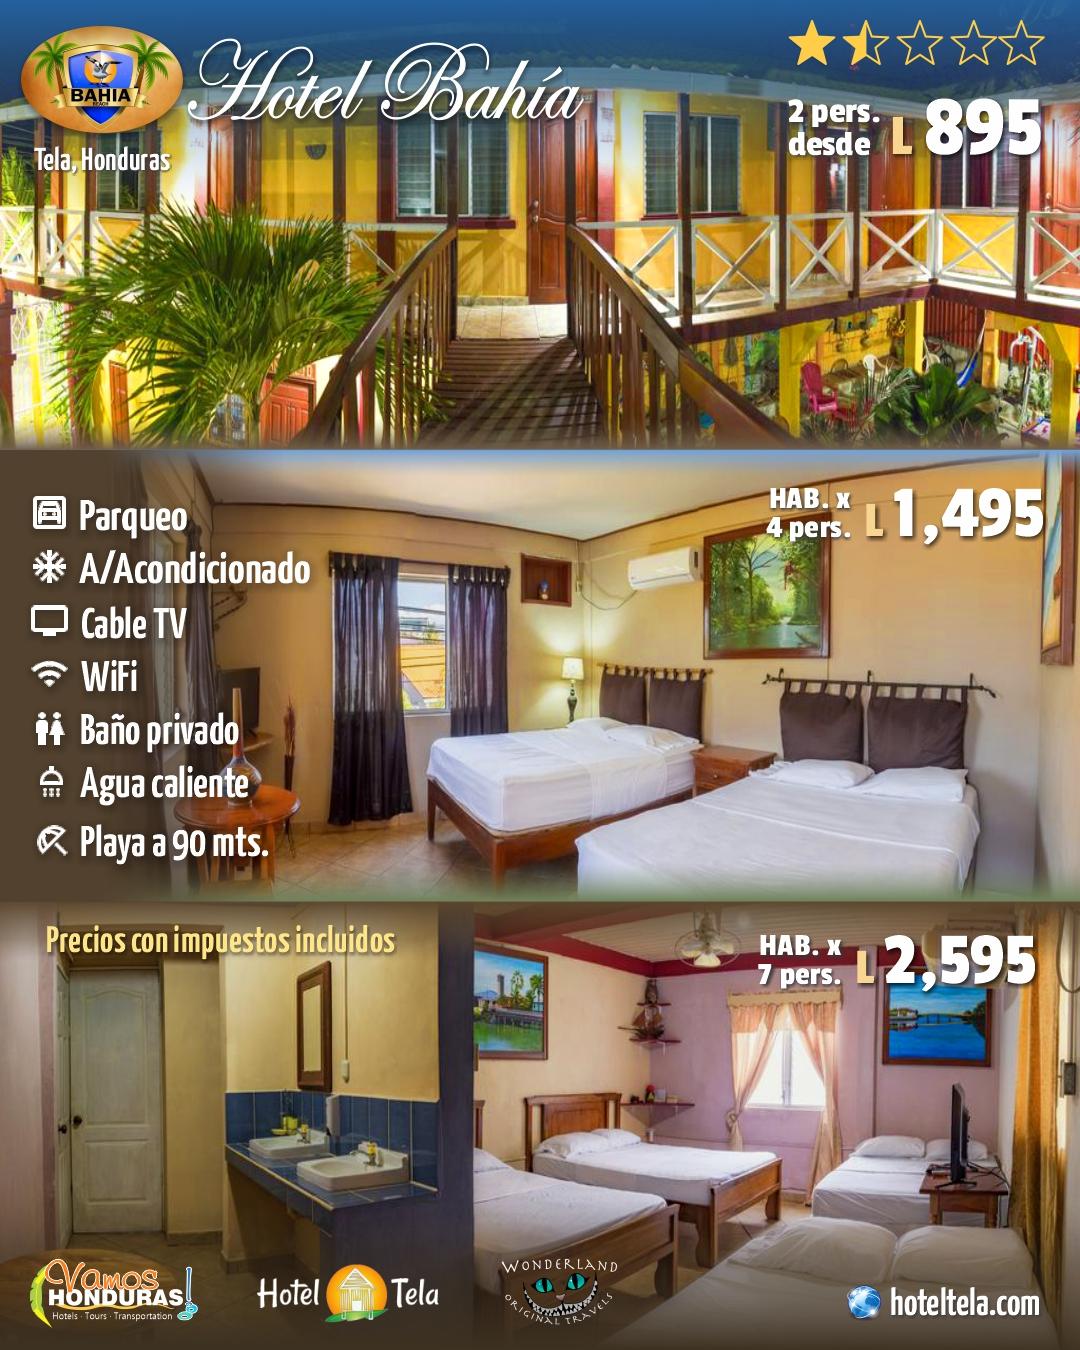 Hotel Bahía Tela, Tela, Honduras